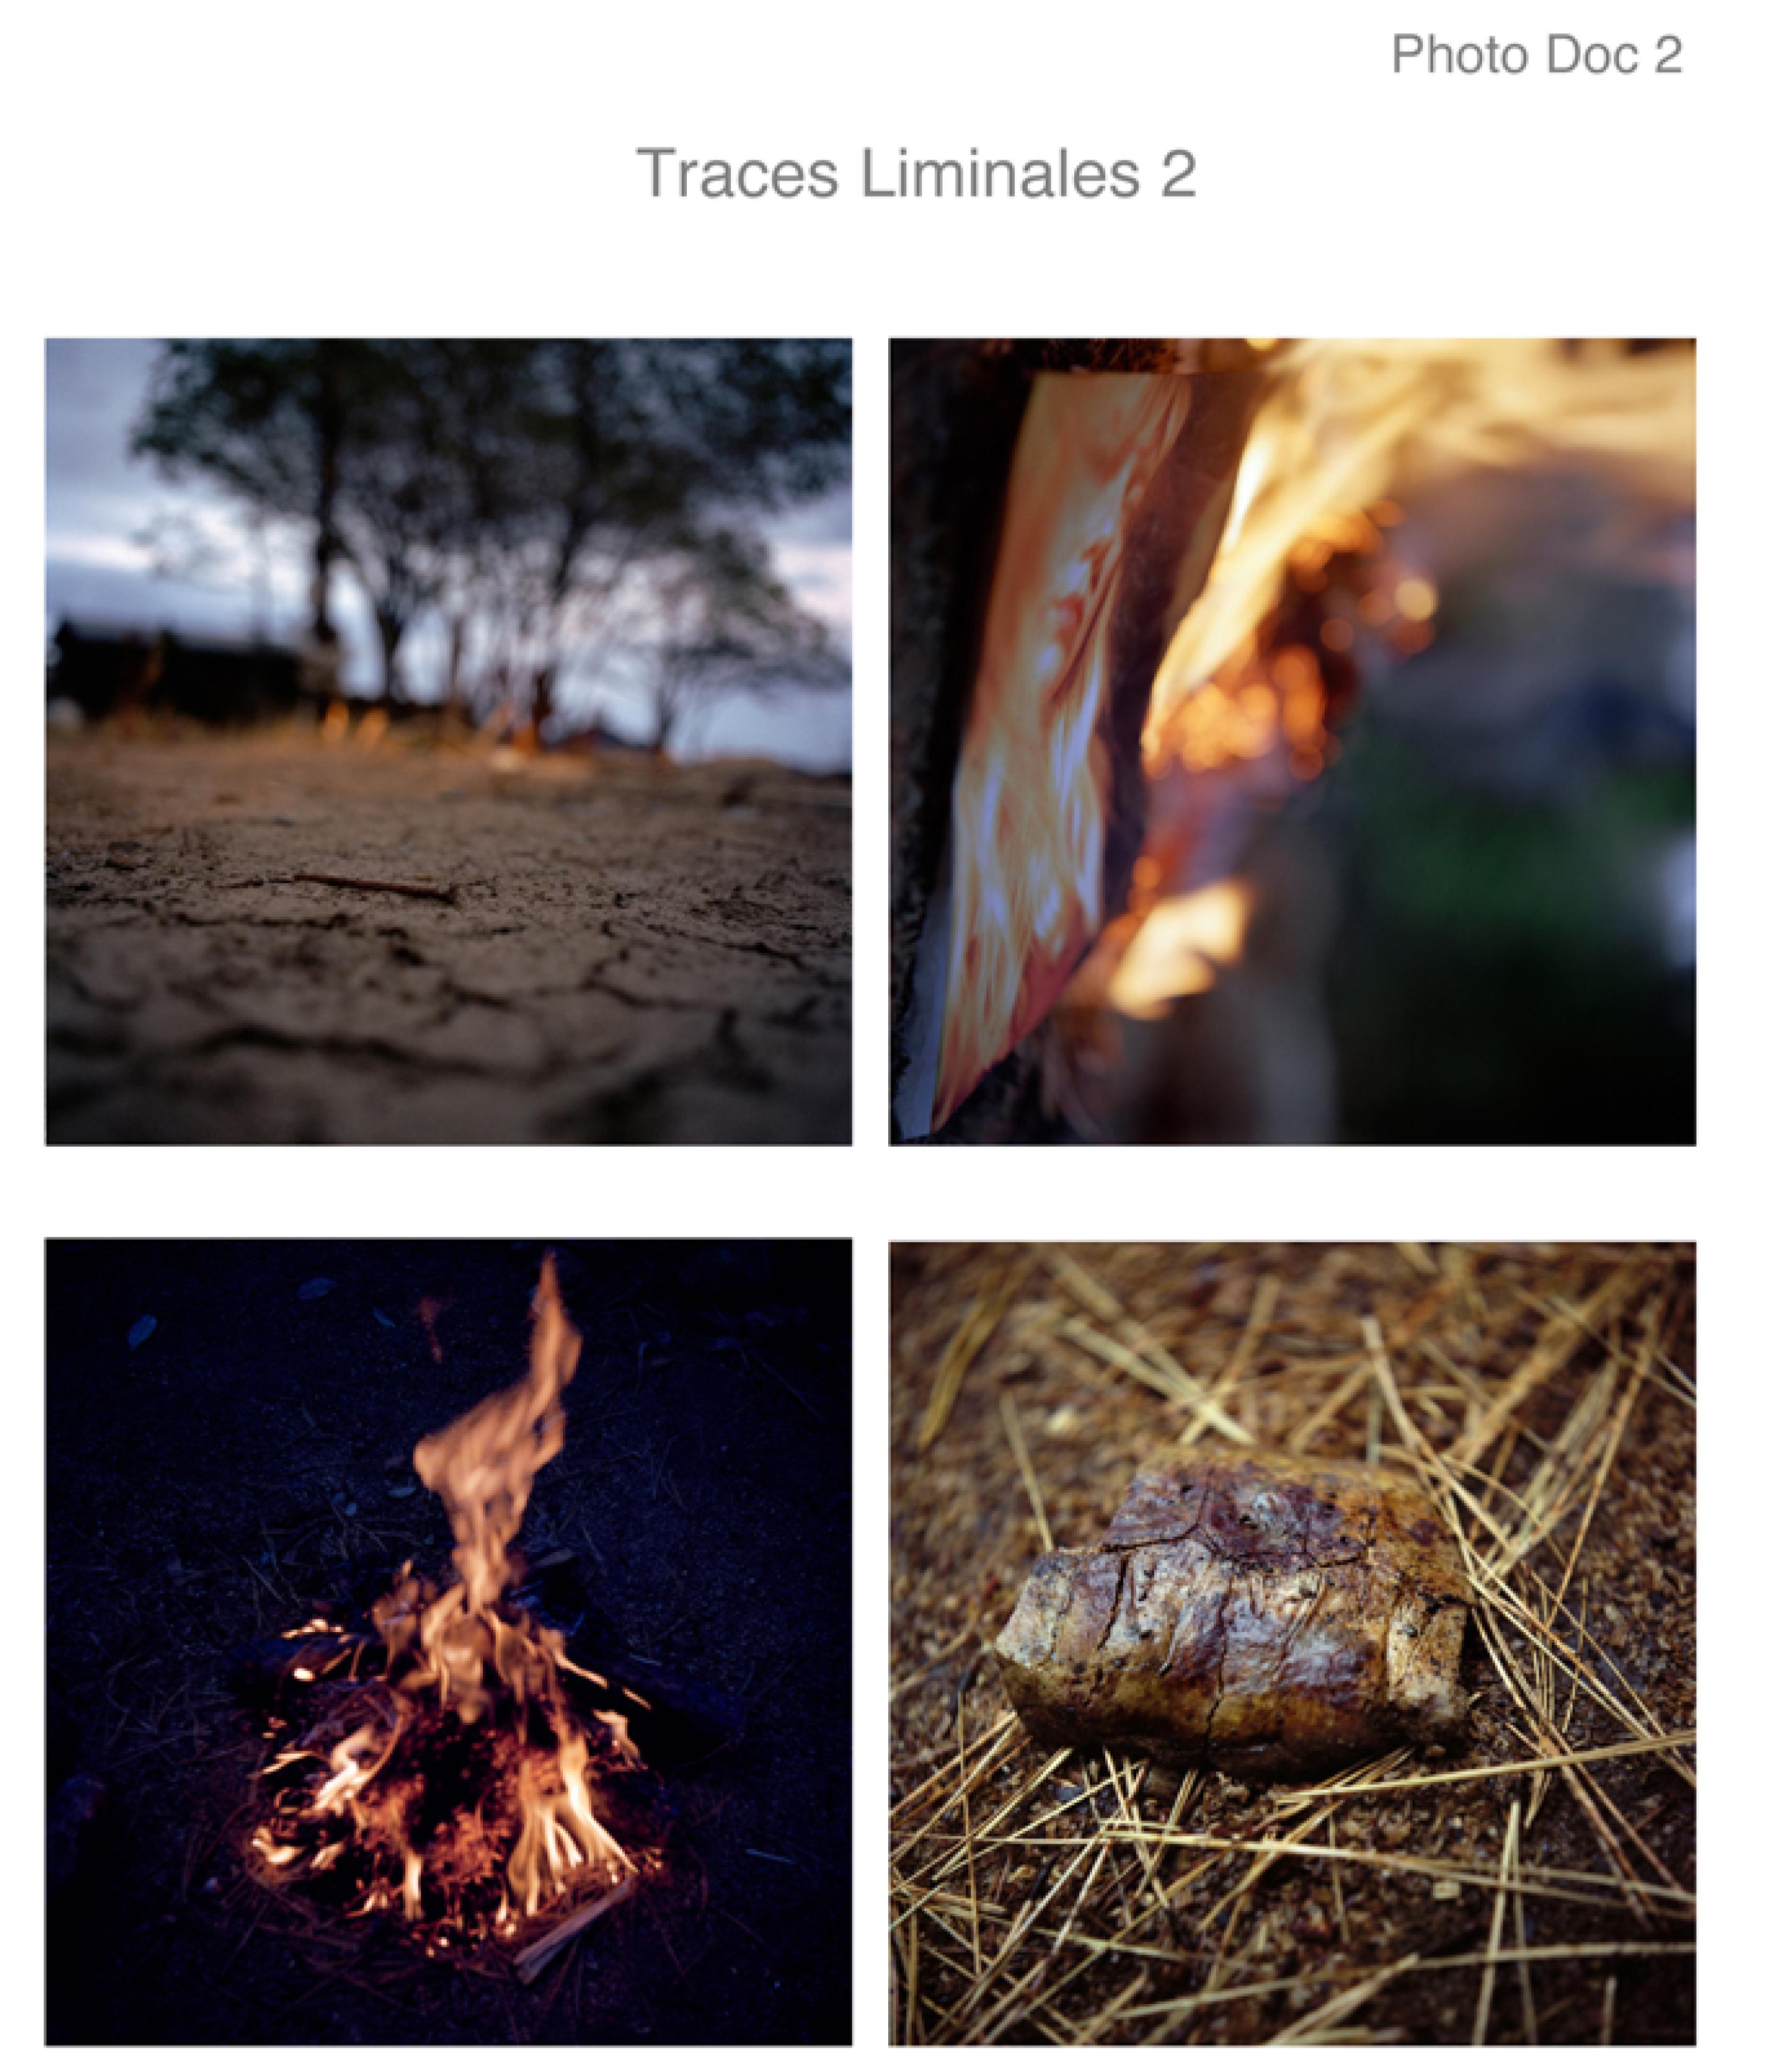 Traces_Liminales-2